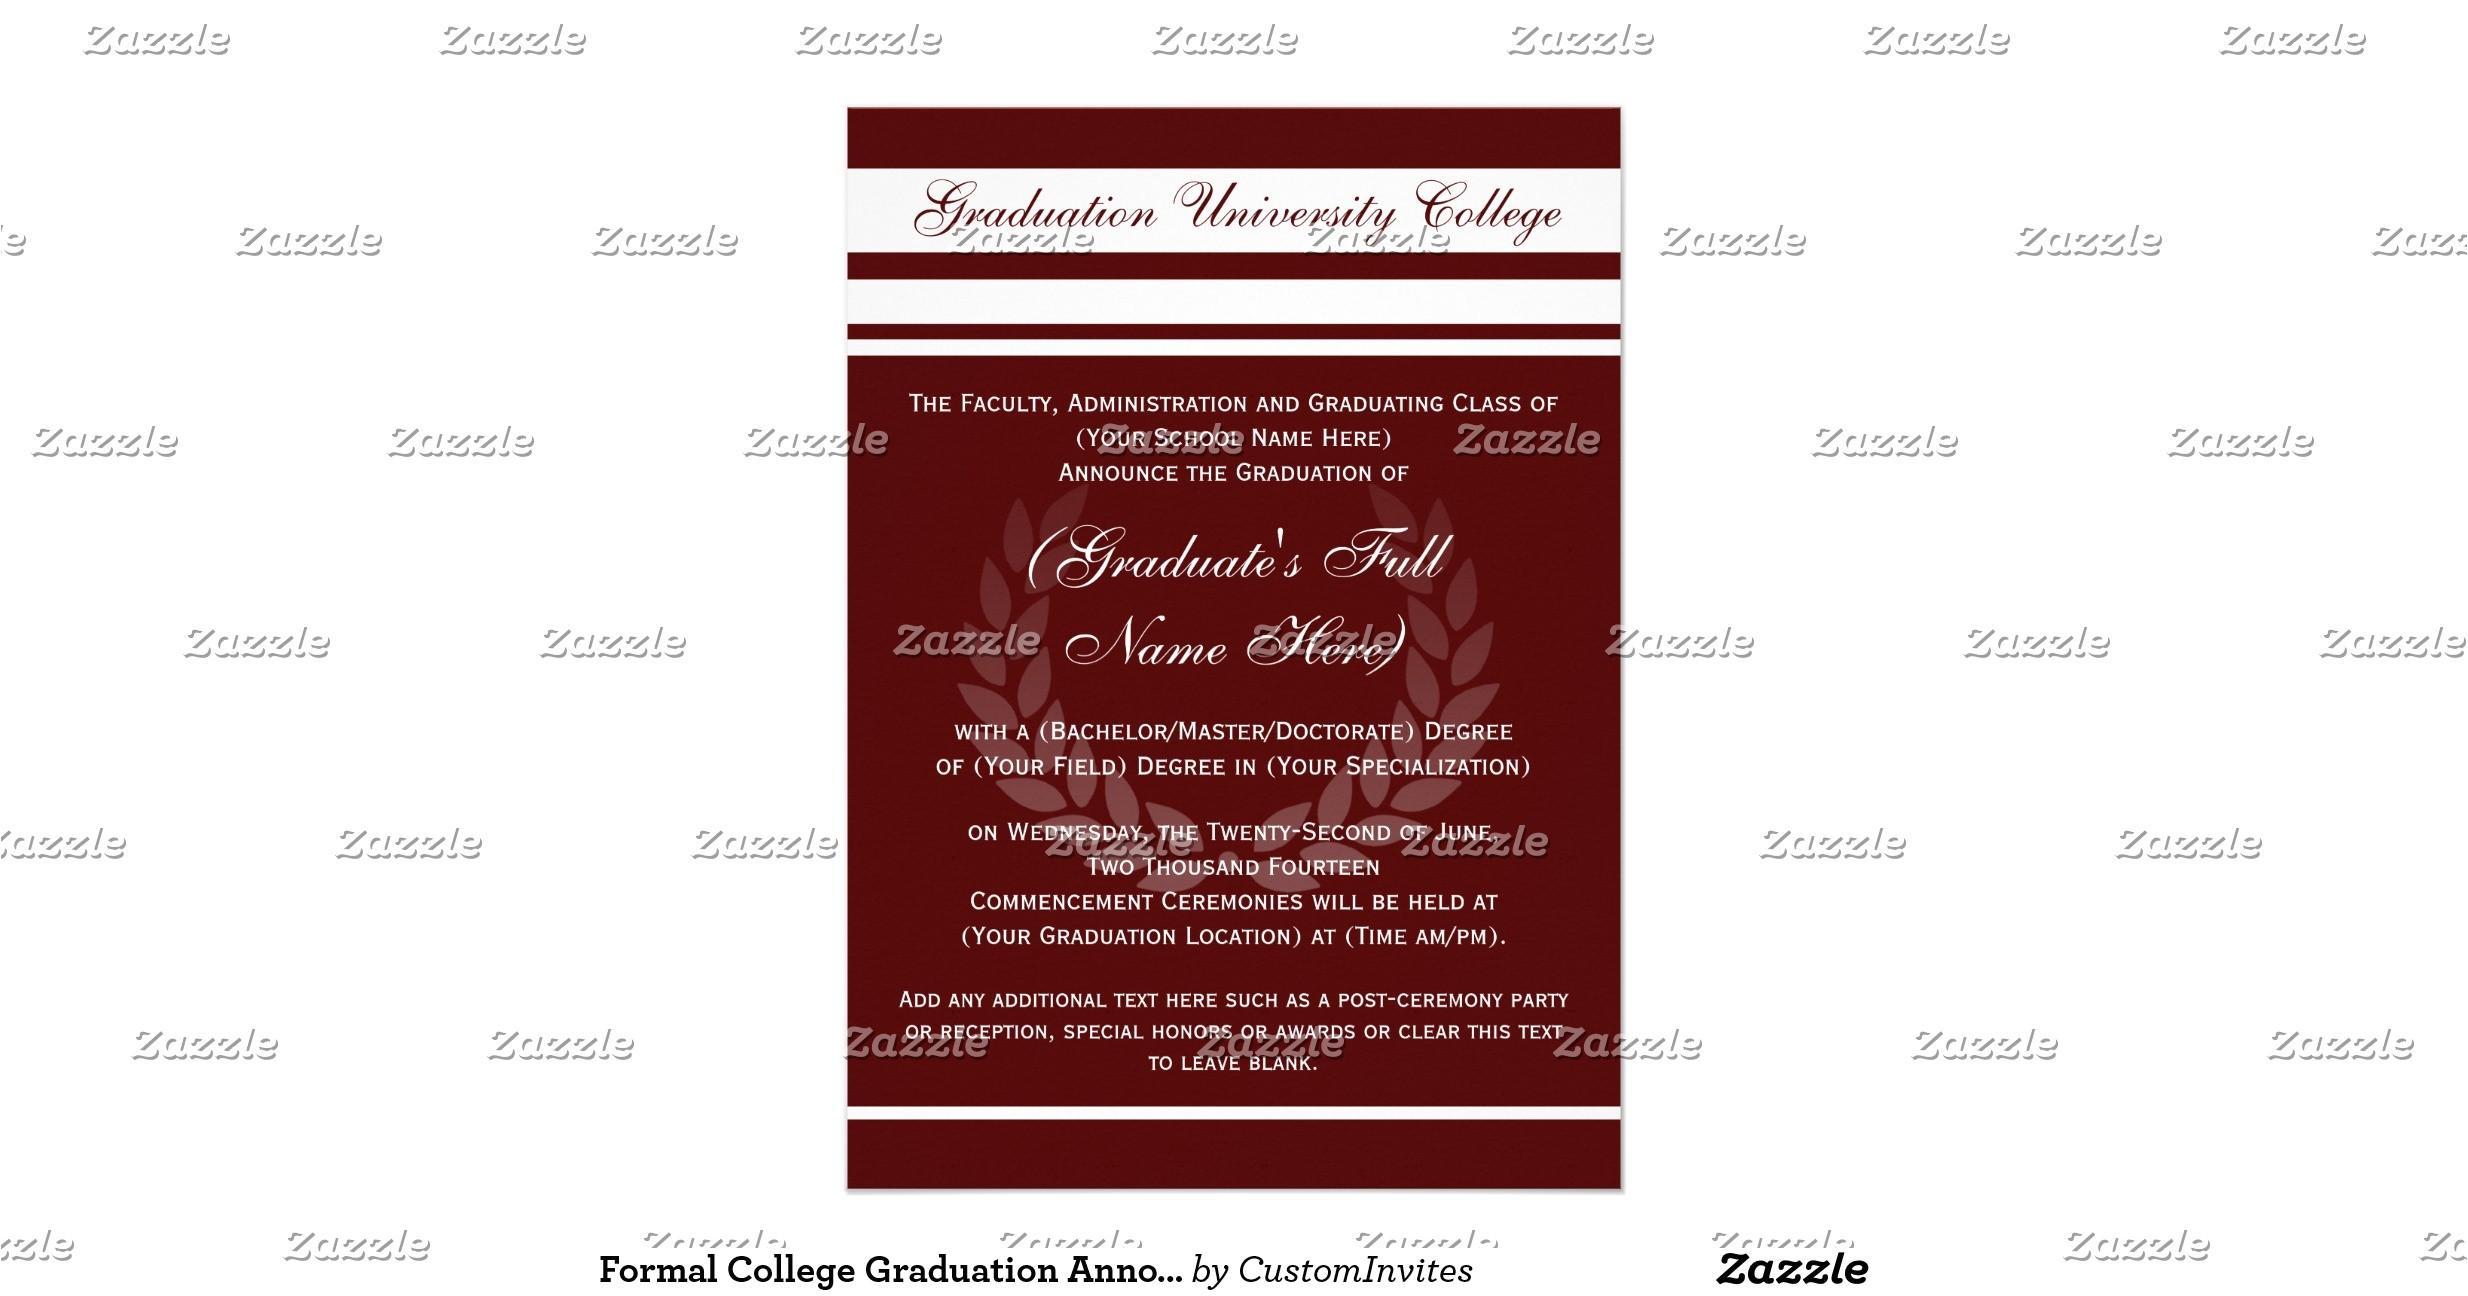 formal college graduation announcements maroon 161178126605710230